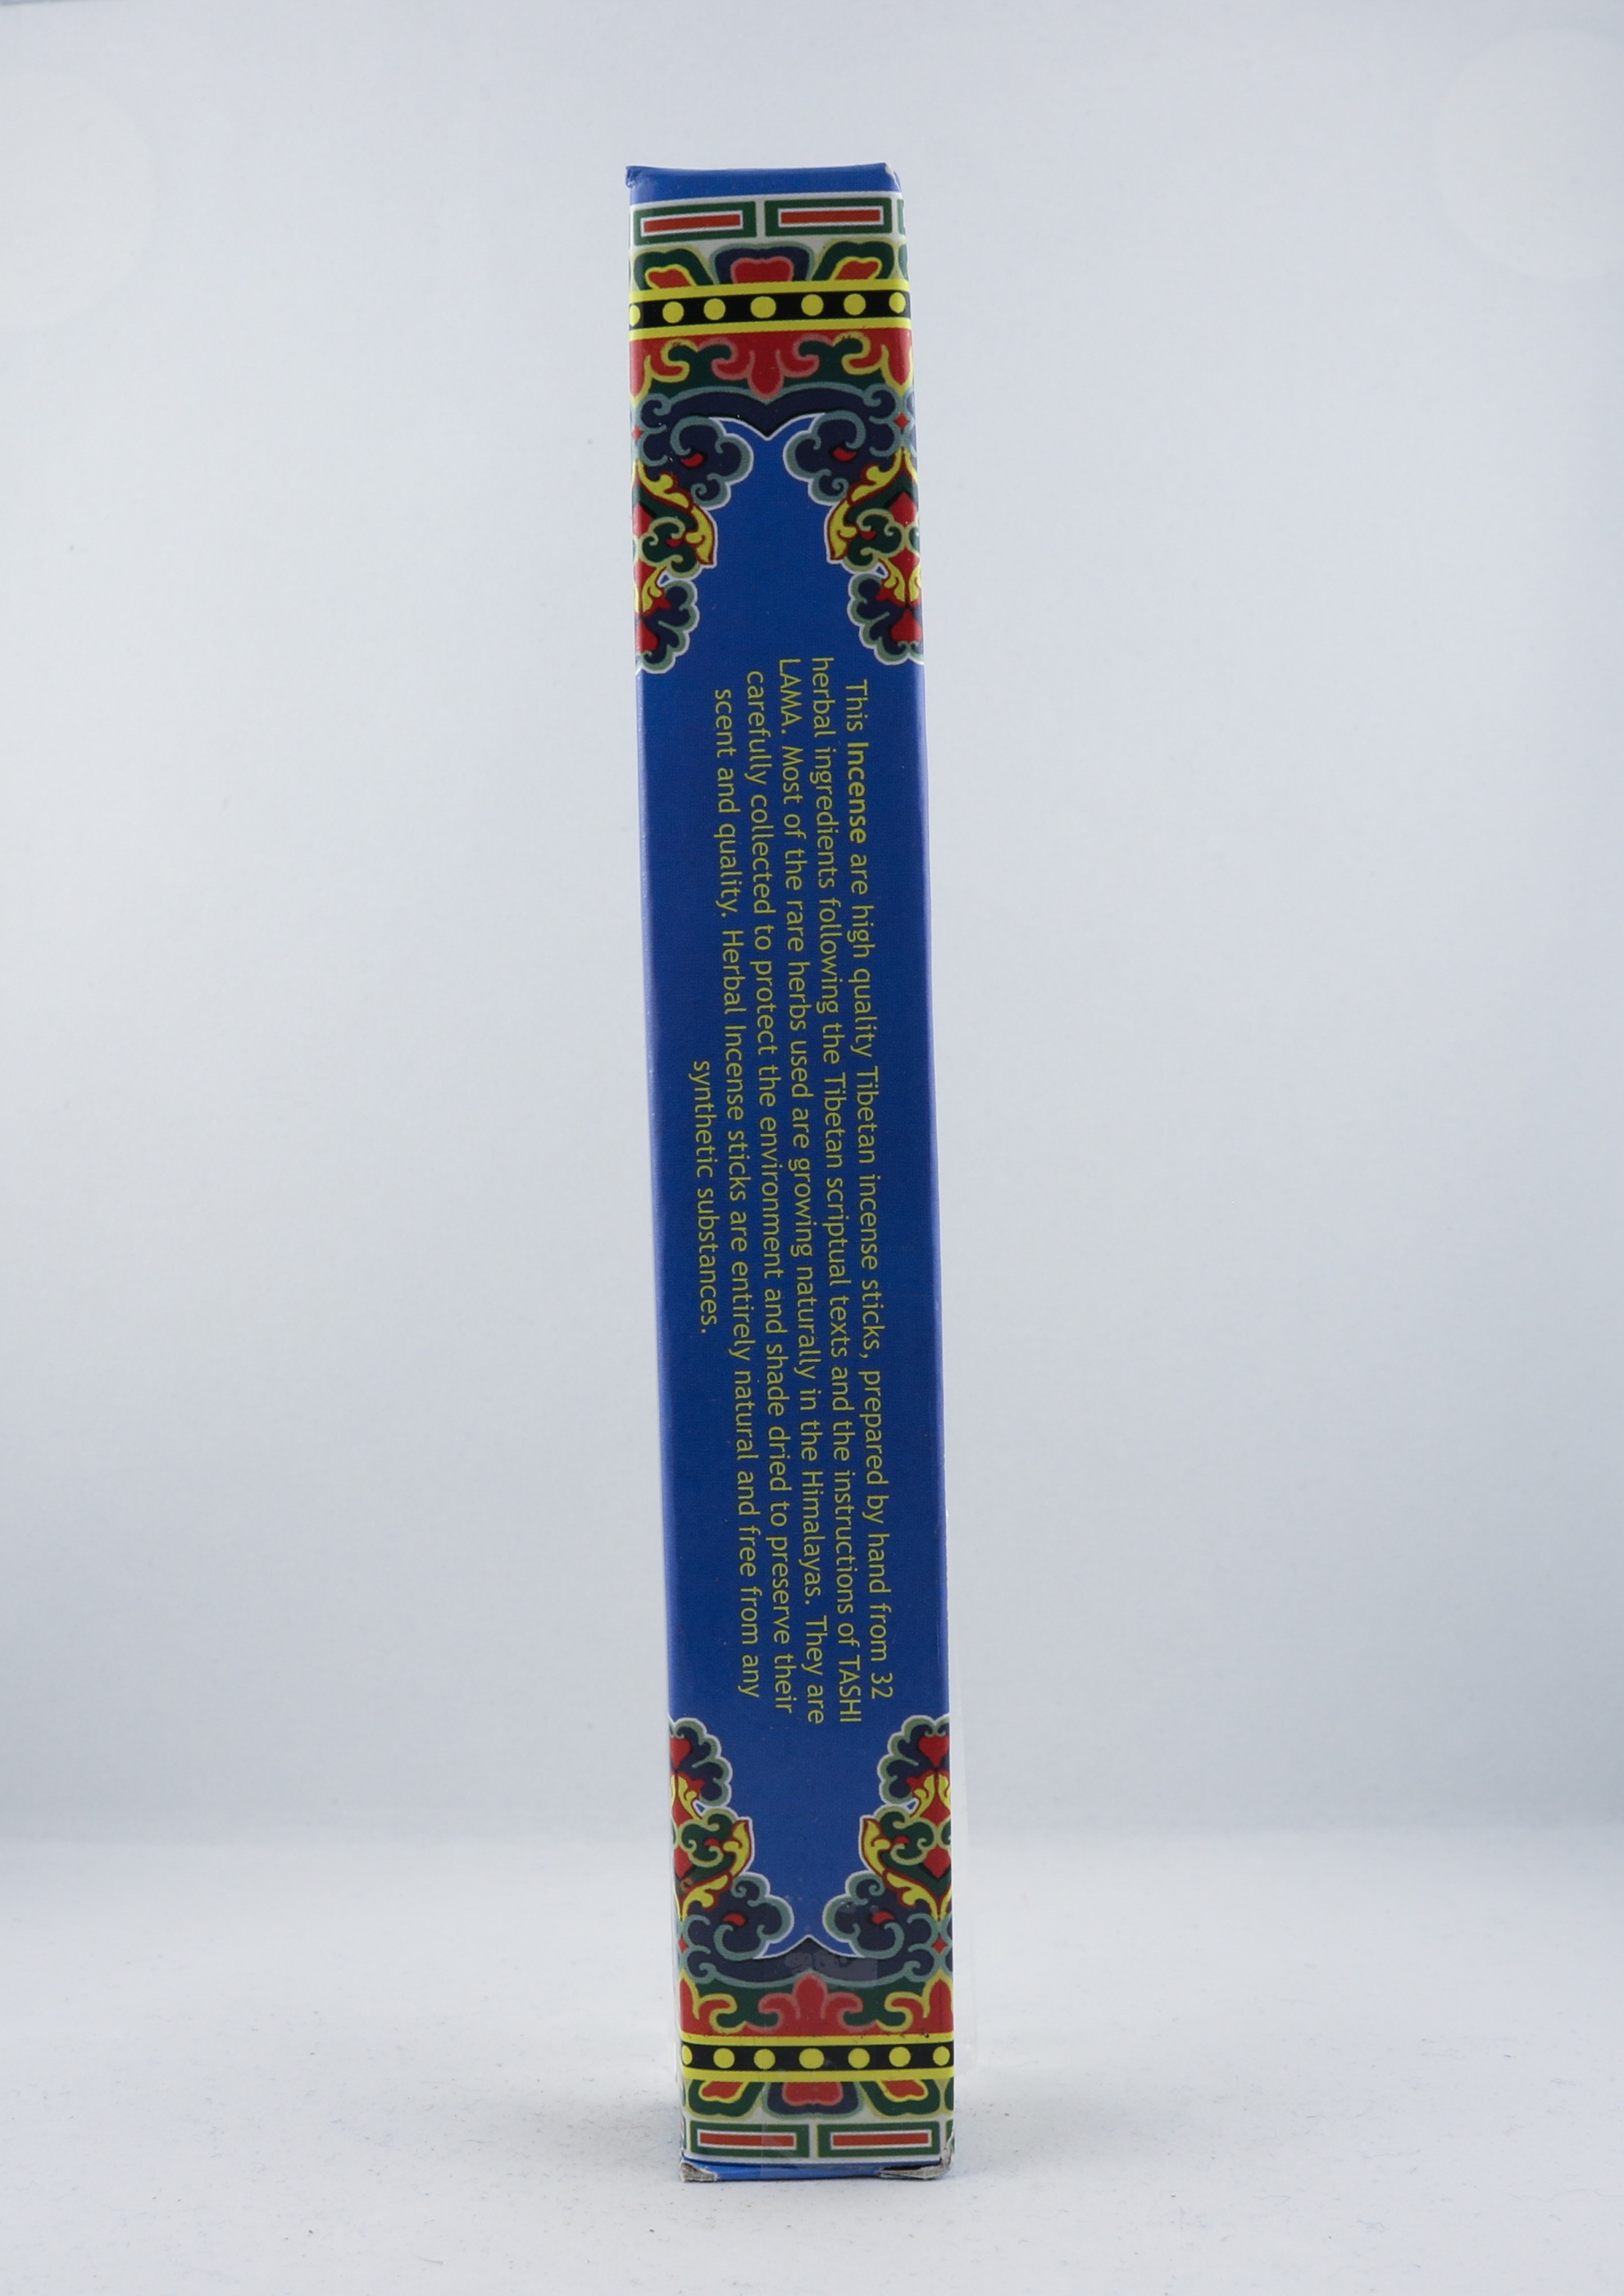 Tibetansk meditations rökelse wellness ayurveda halmstad sweden svensk aroma aromer